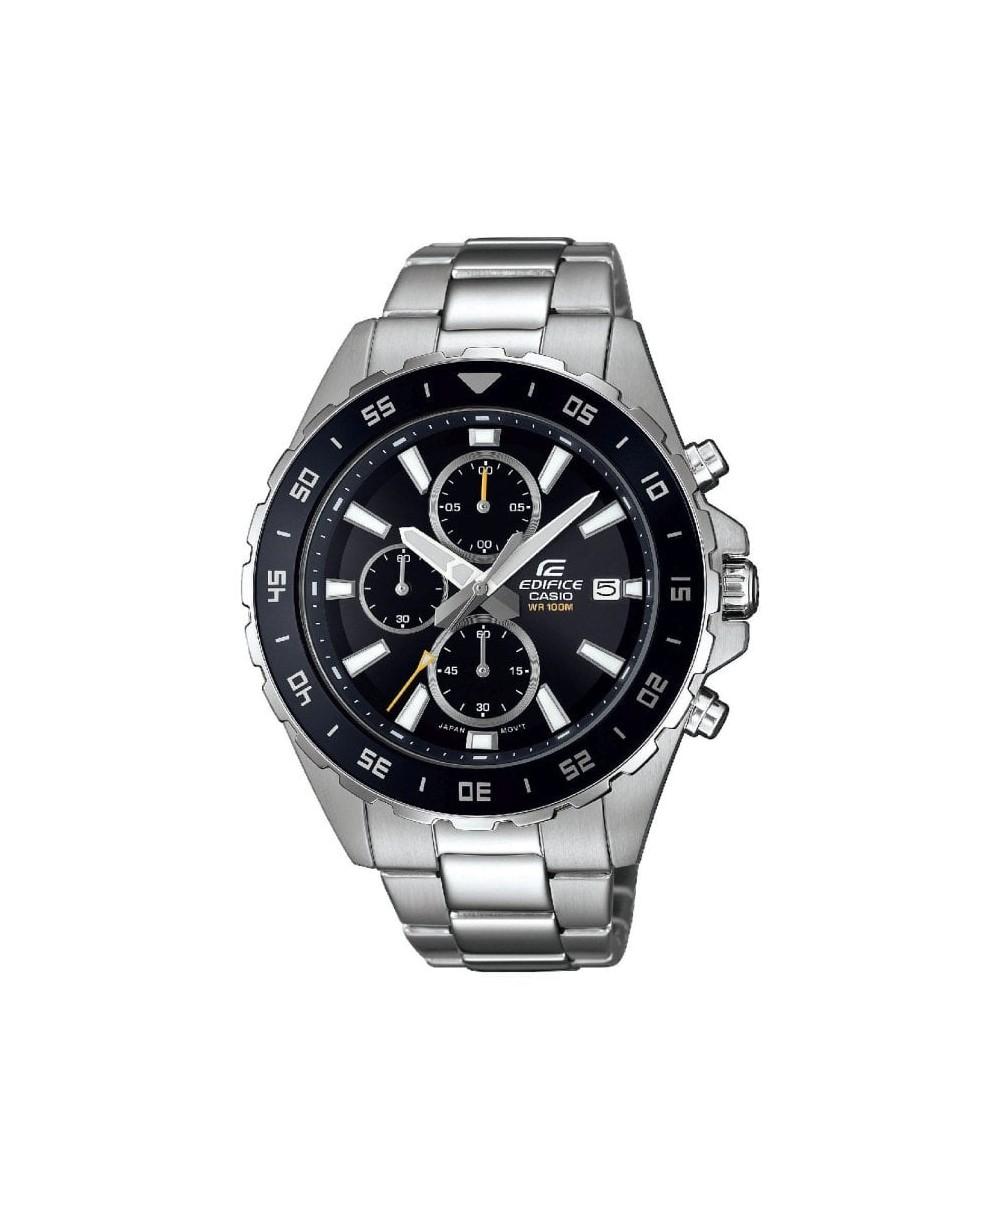 Reloj Casio EFR-568D-1AVUEF